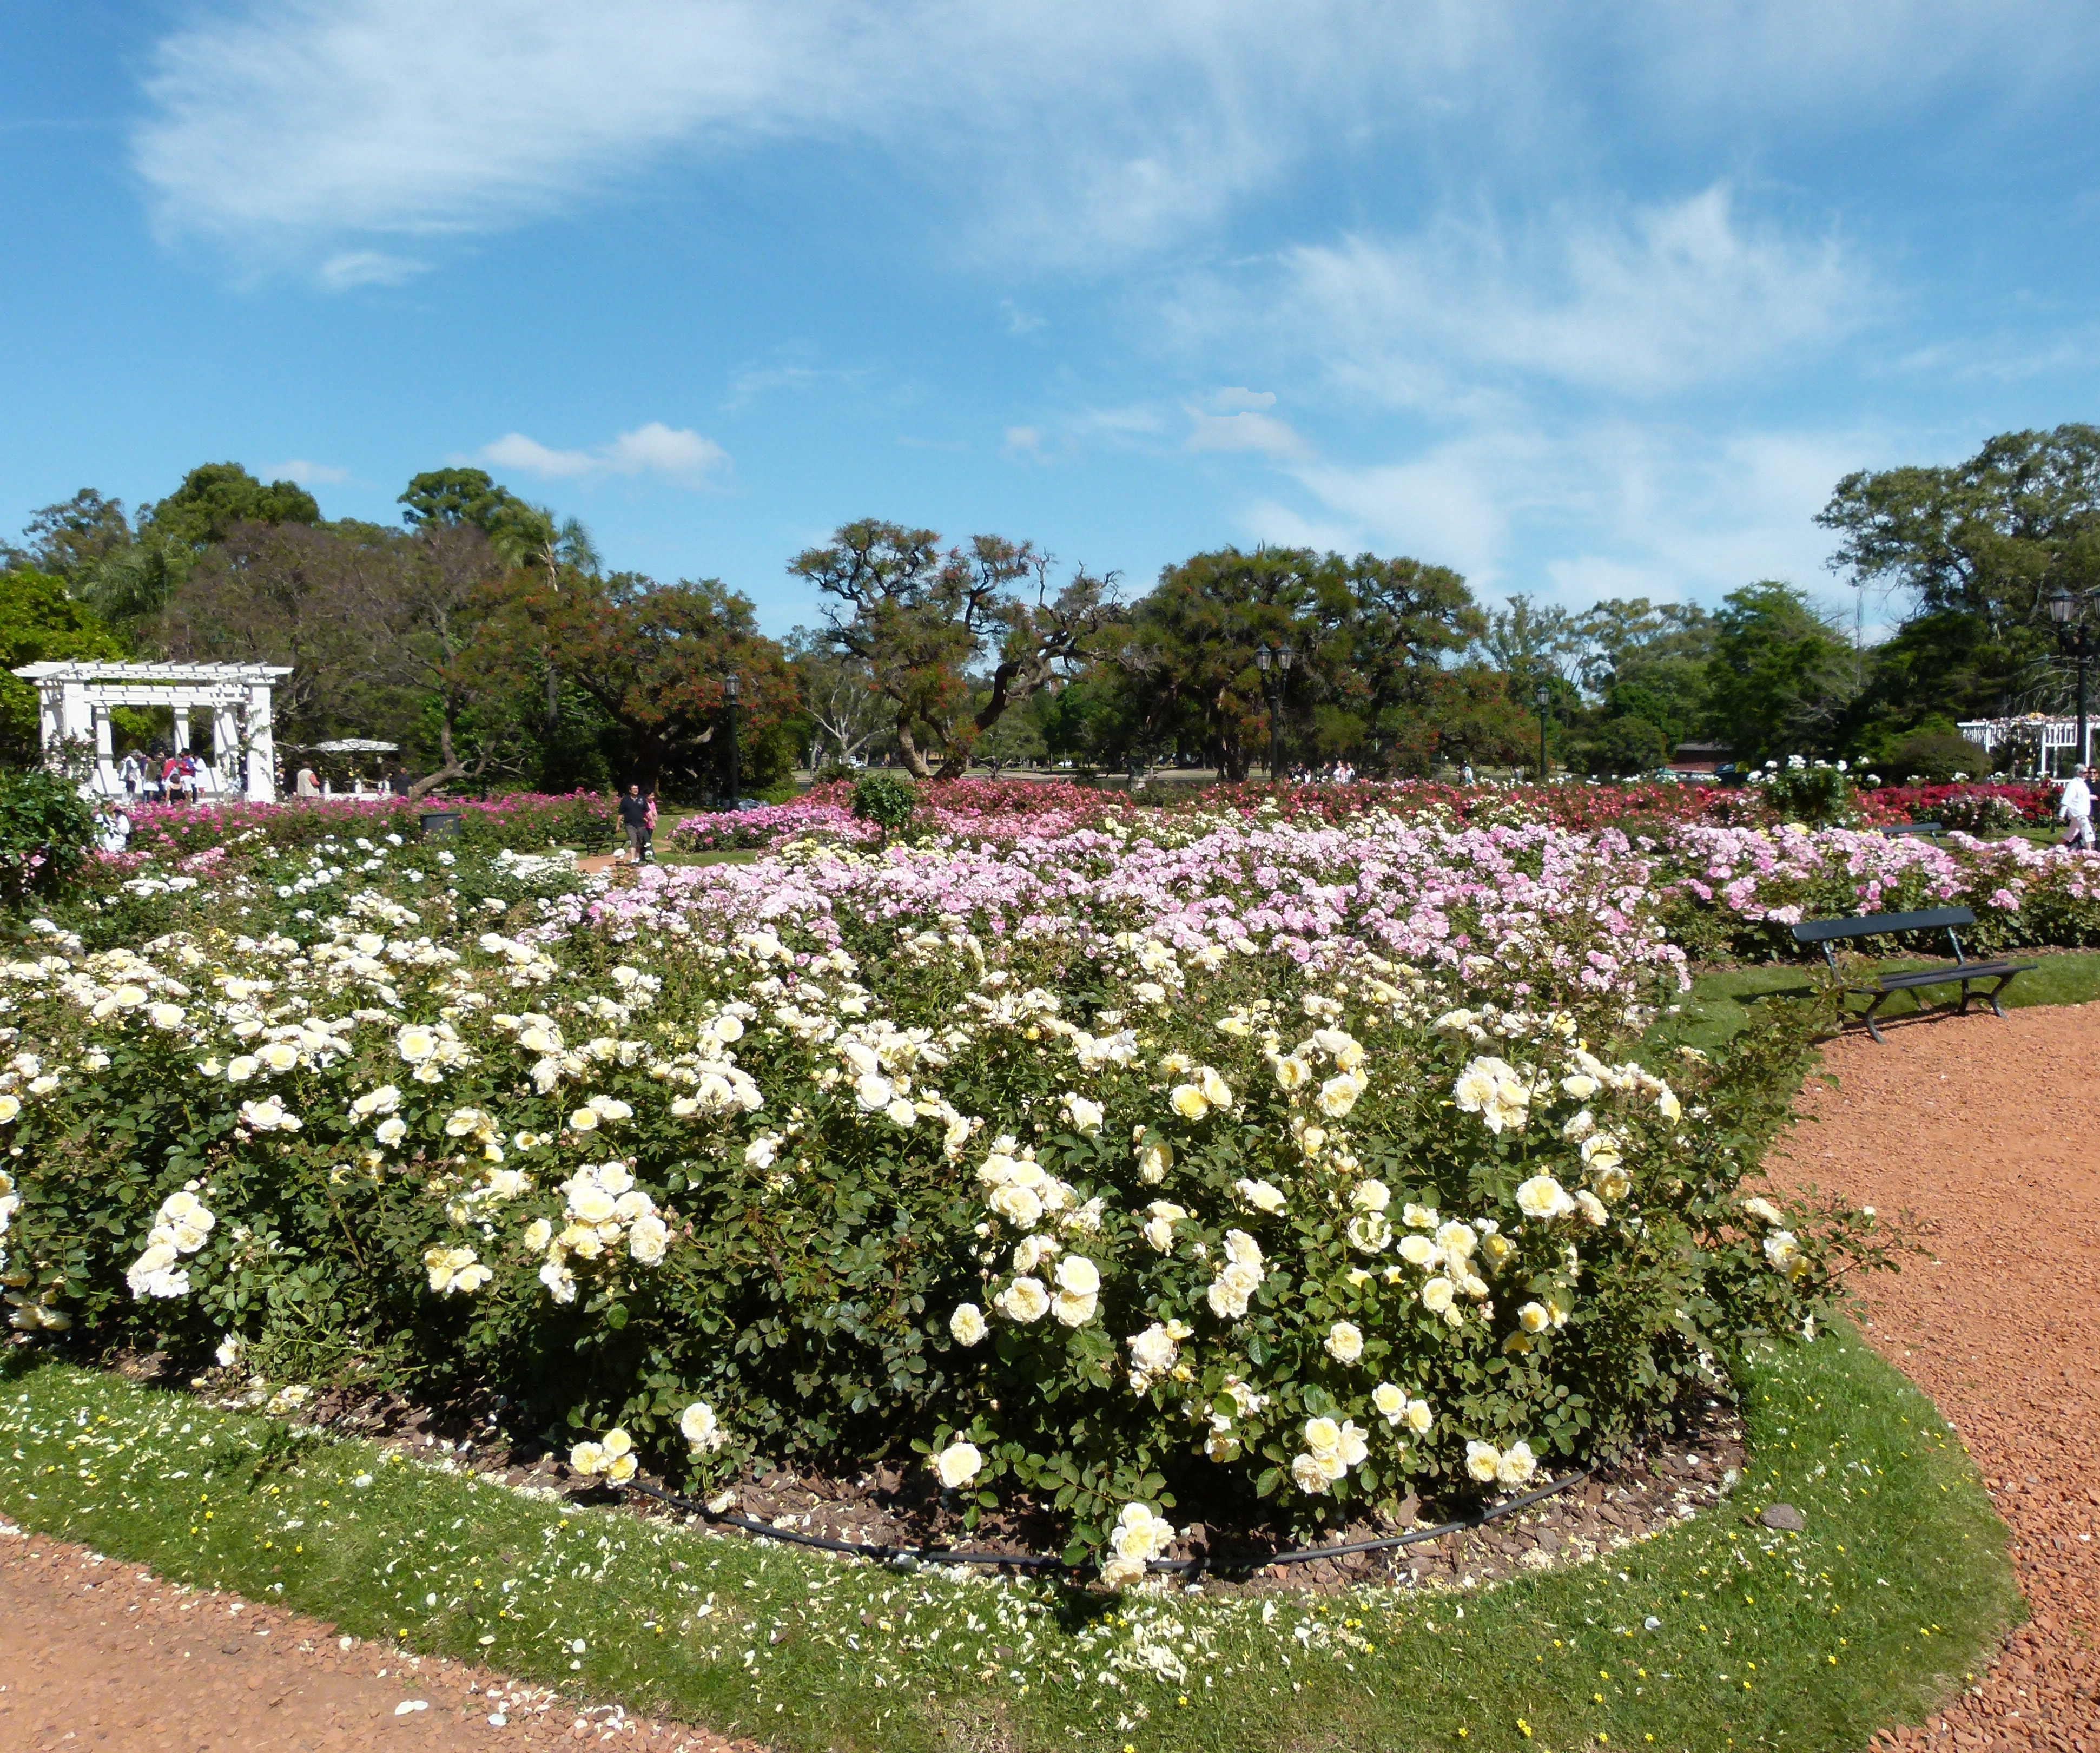 2nd 10b_Carol Bowen_El Rosedal Garden